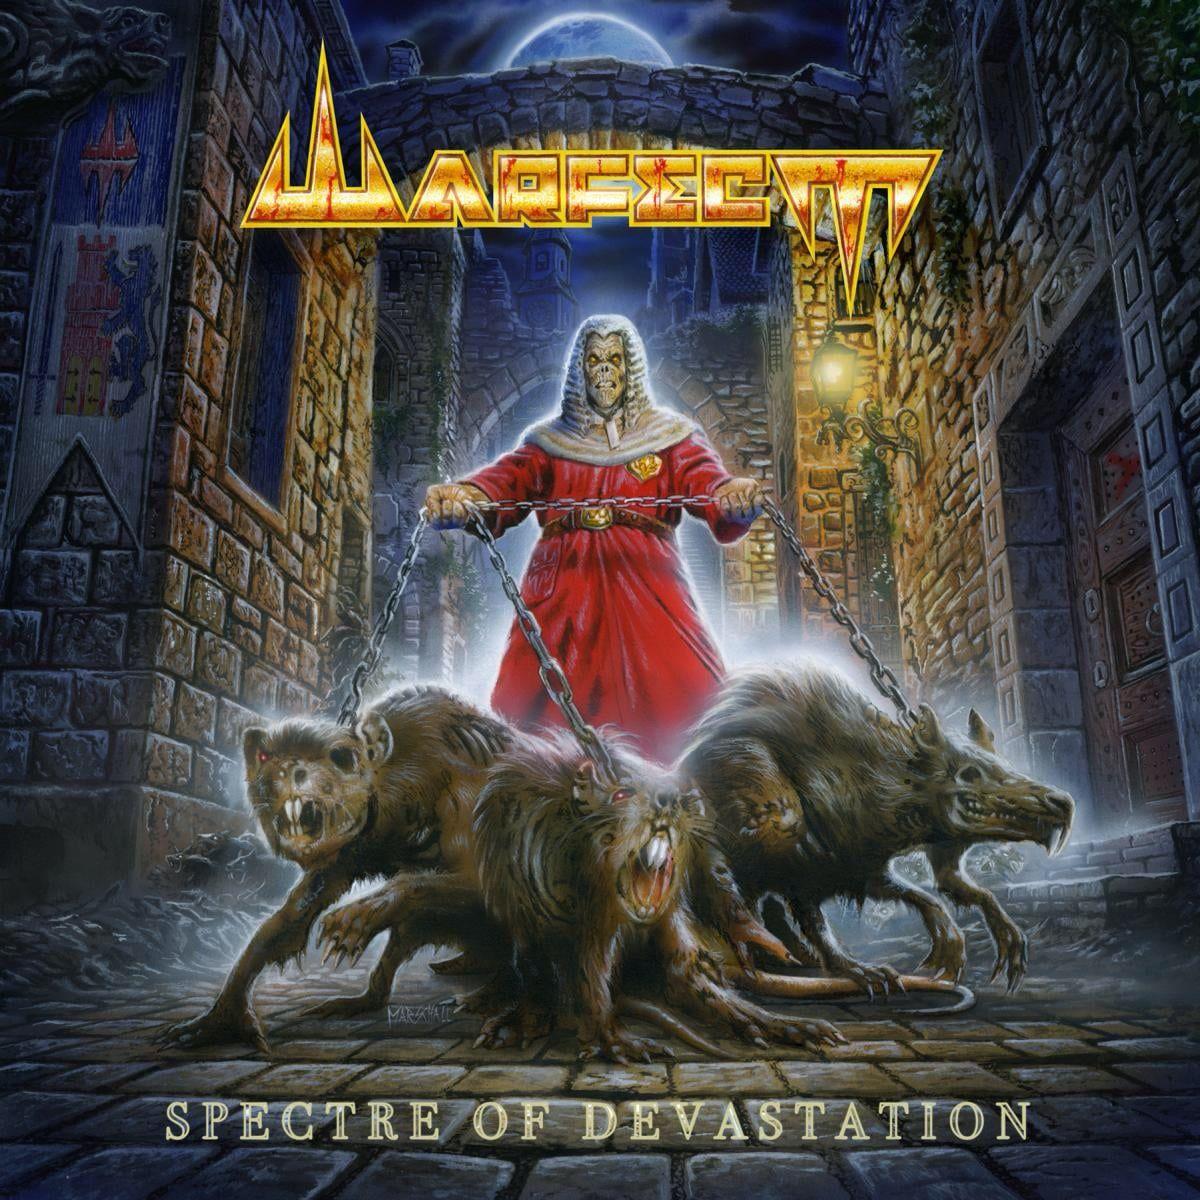 warfect - Spectre of Devastation - album cover